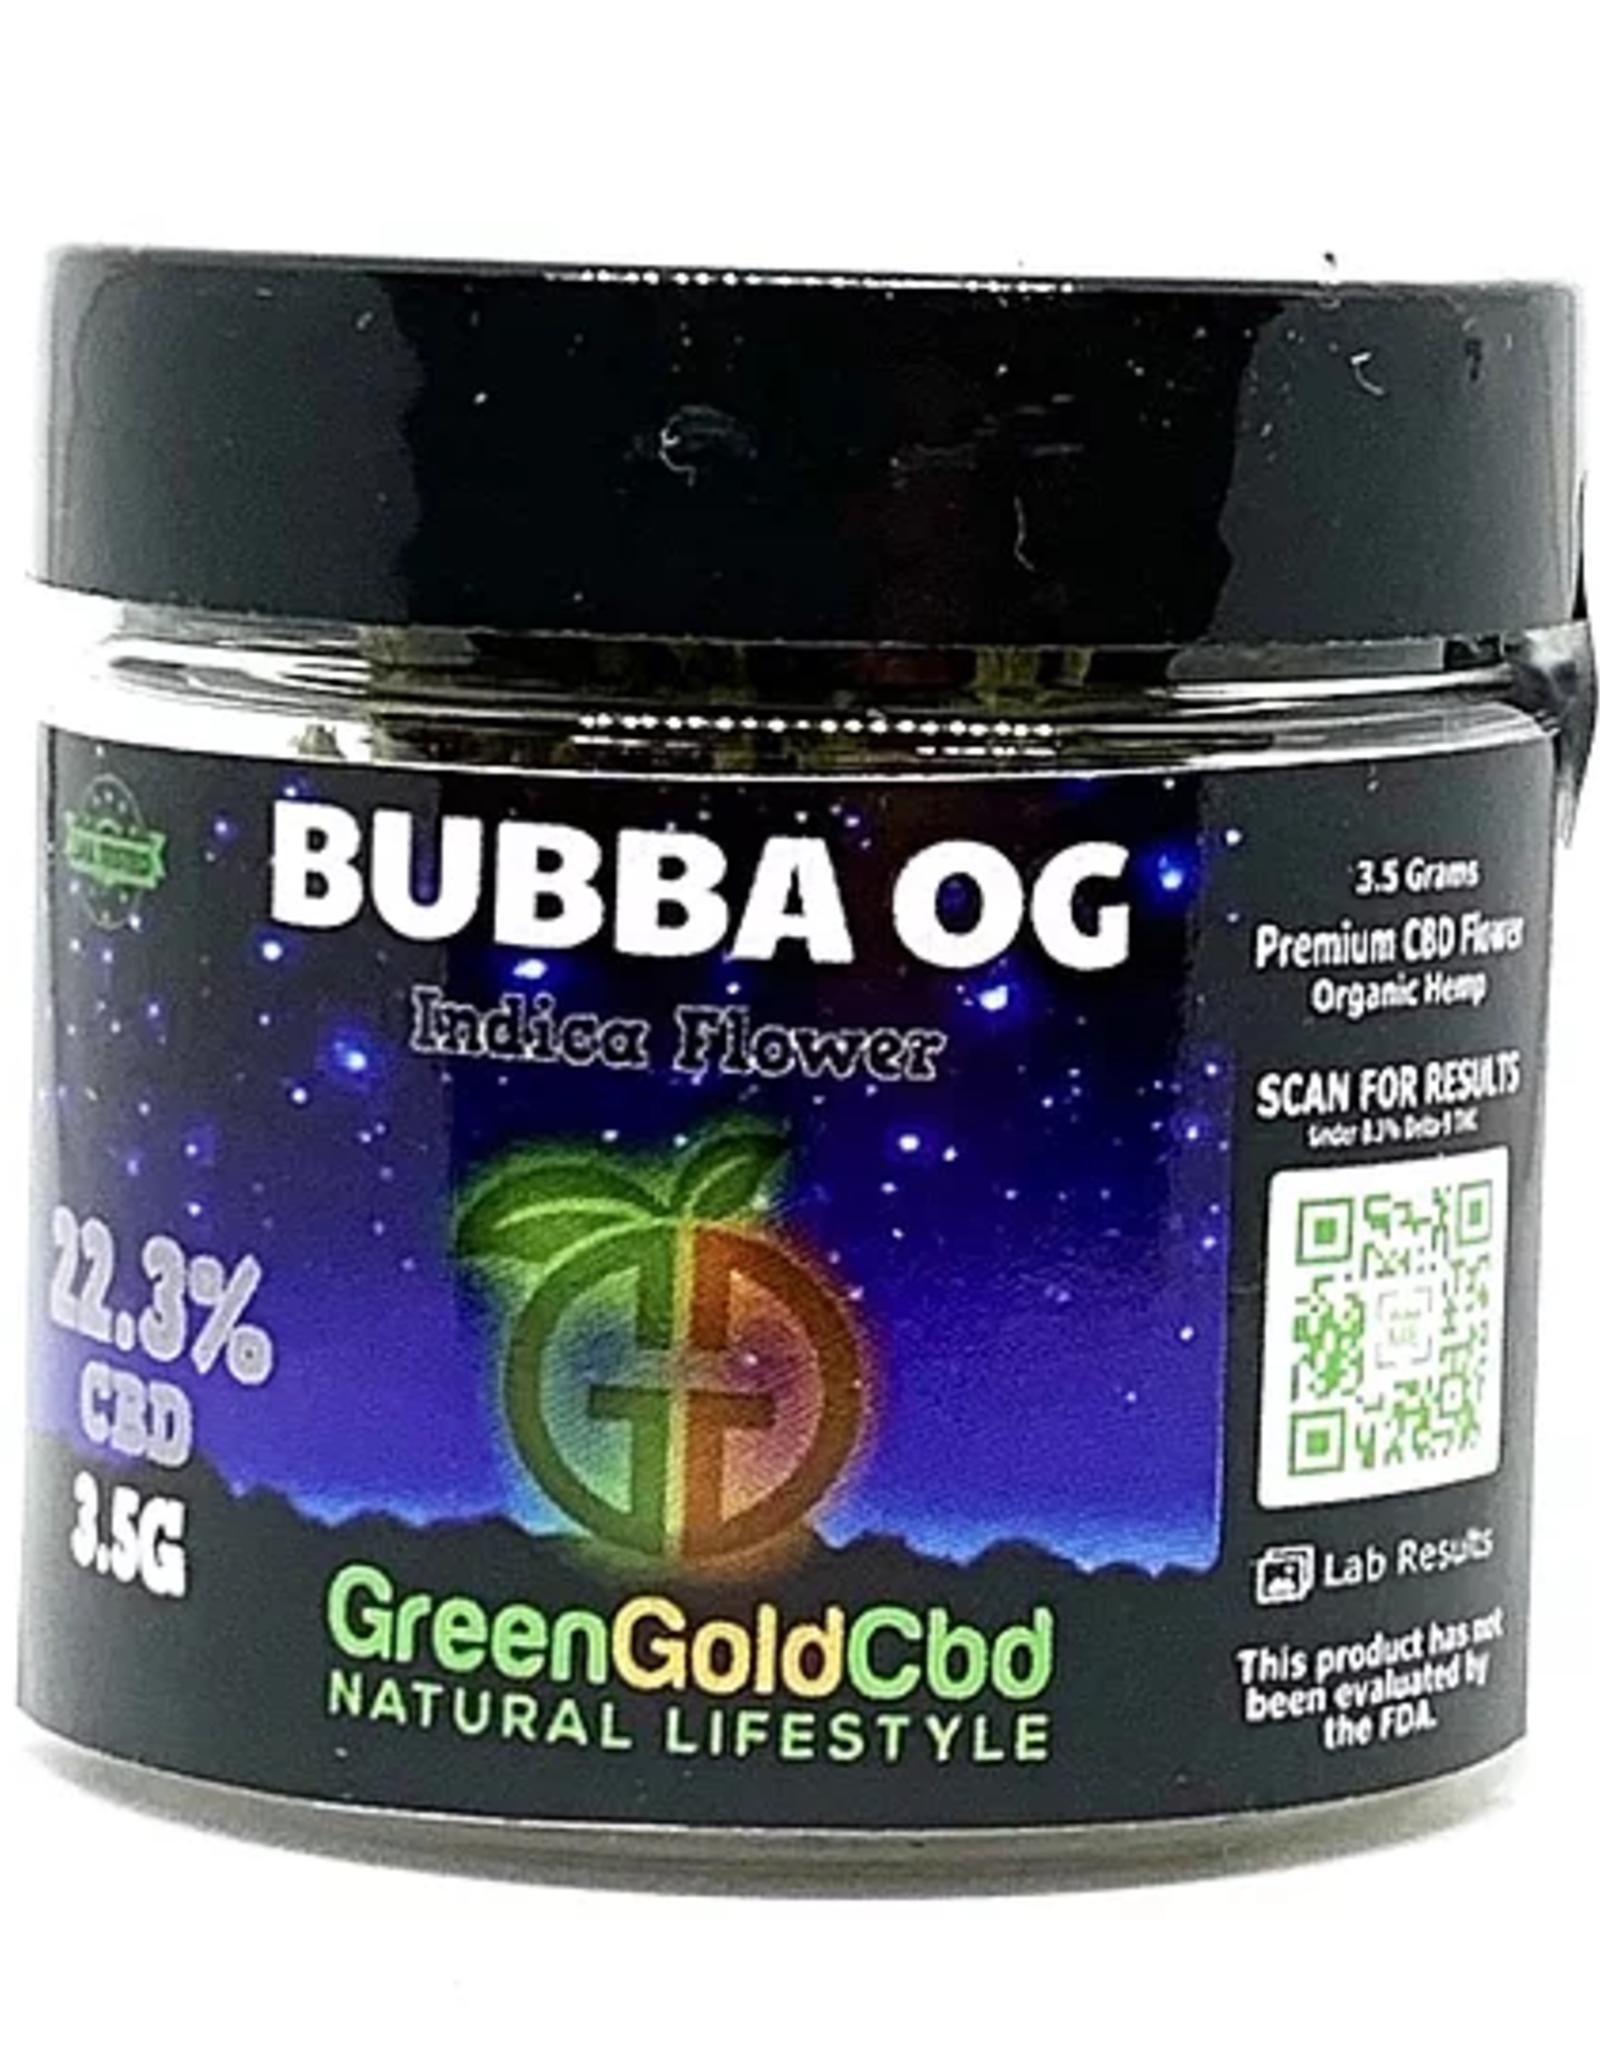 Green Gold CBD CBD Flower Bubba OG, 3.5g 22.3% CBD